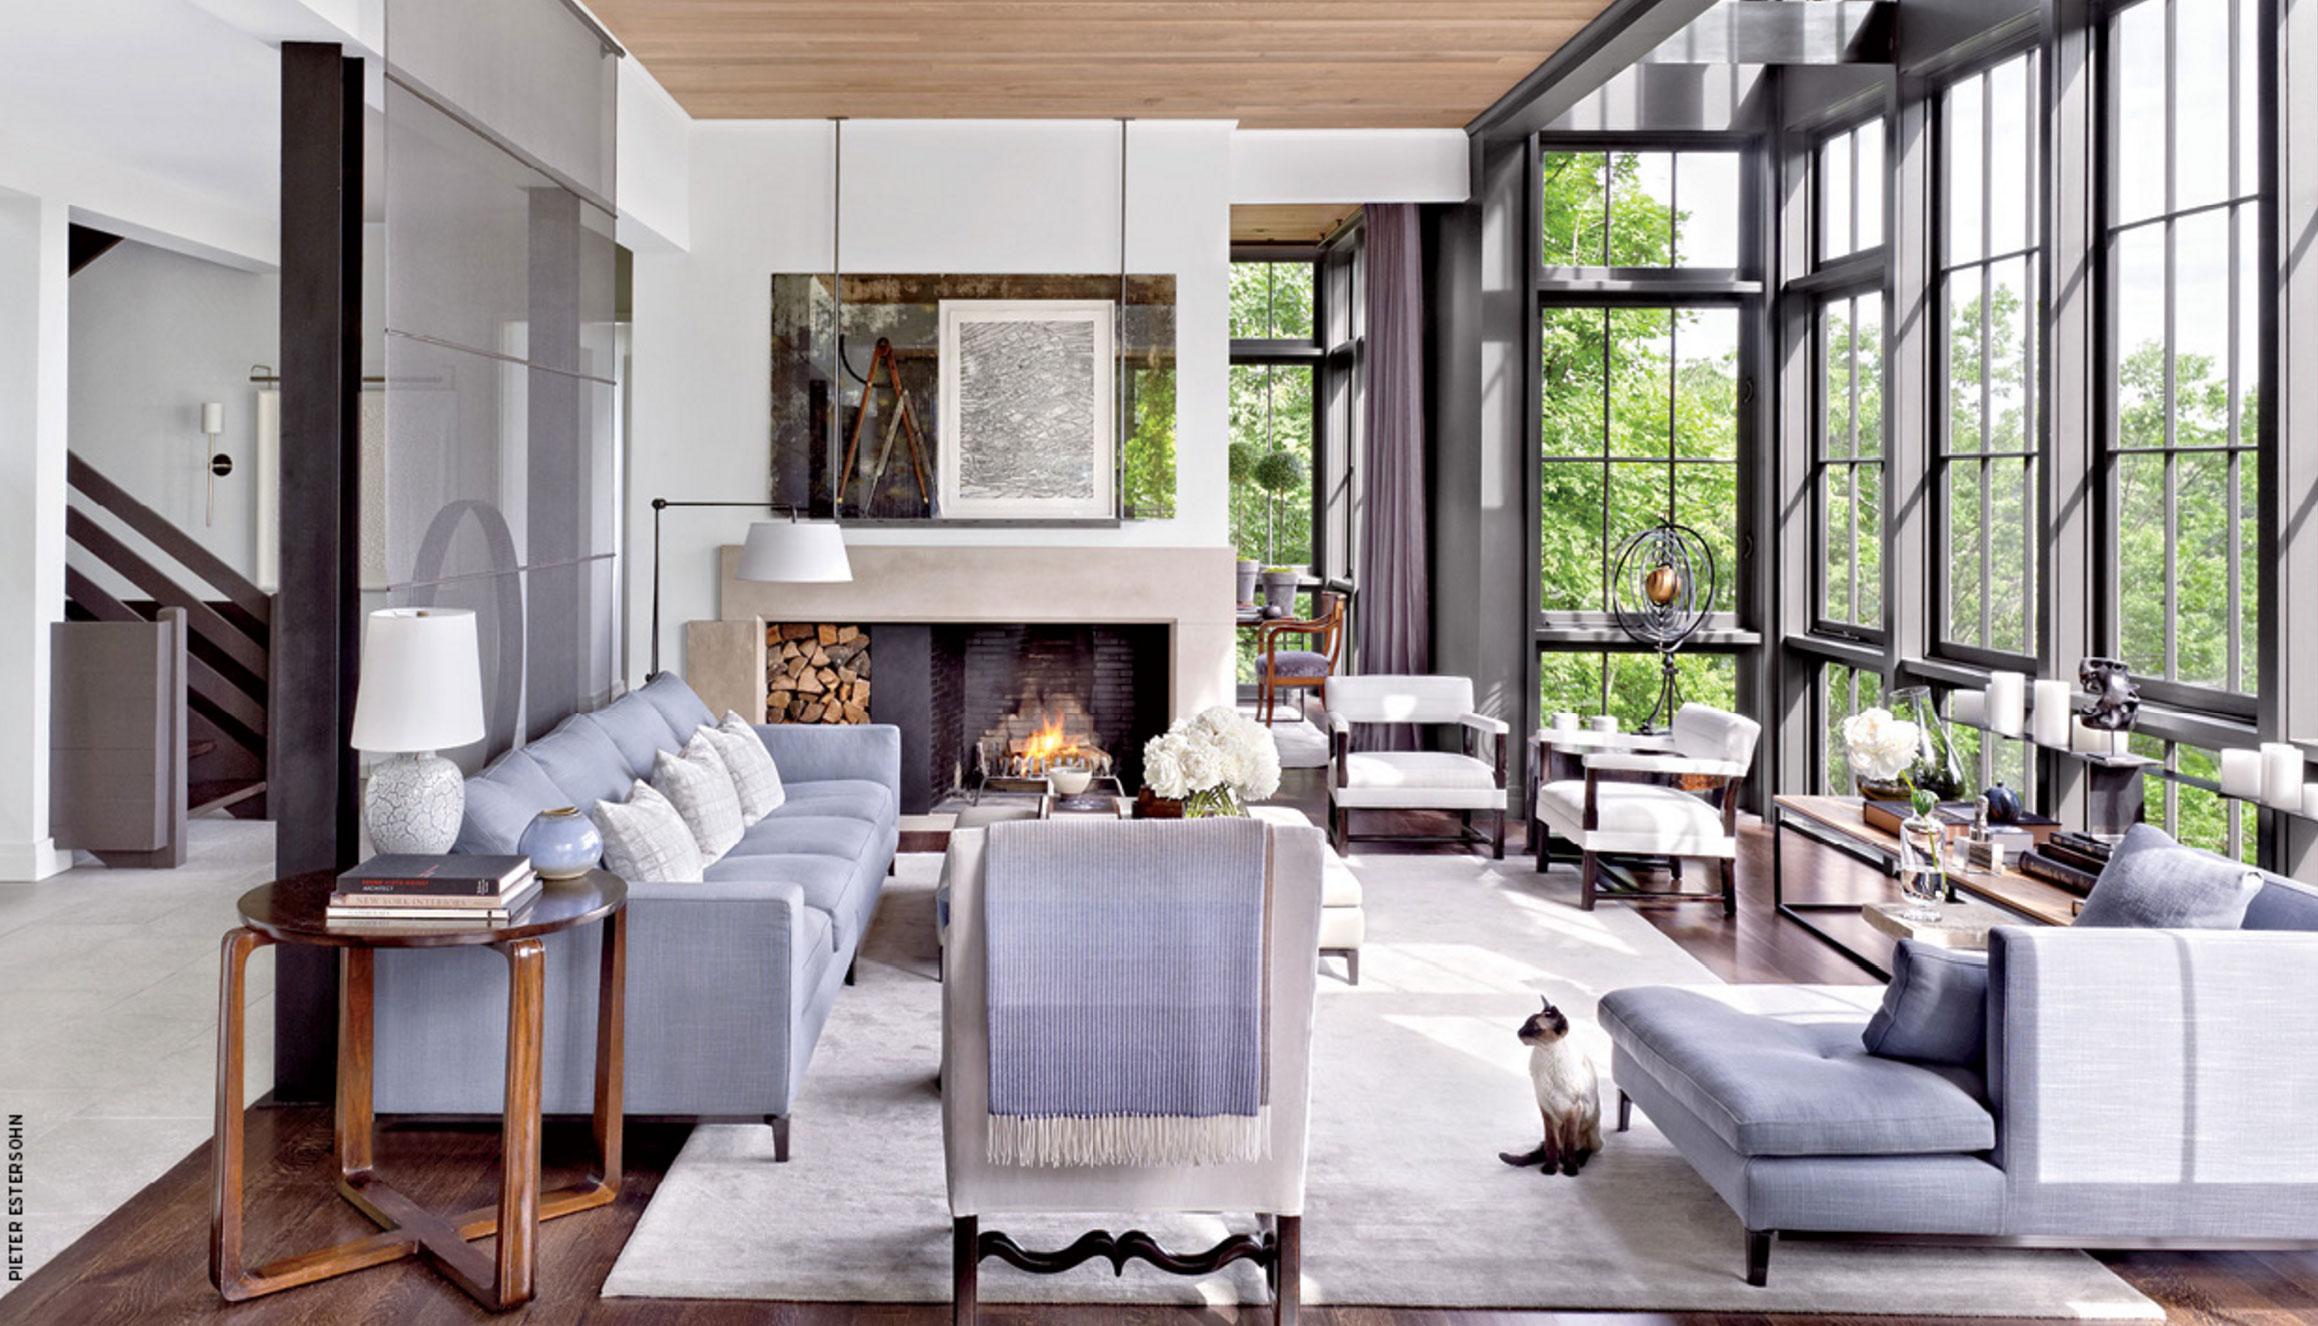 2017 Architectural Digest Home Show Inhabitat Green